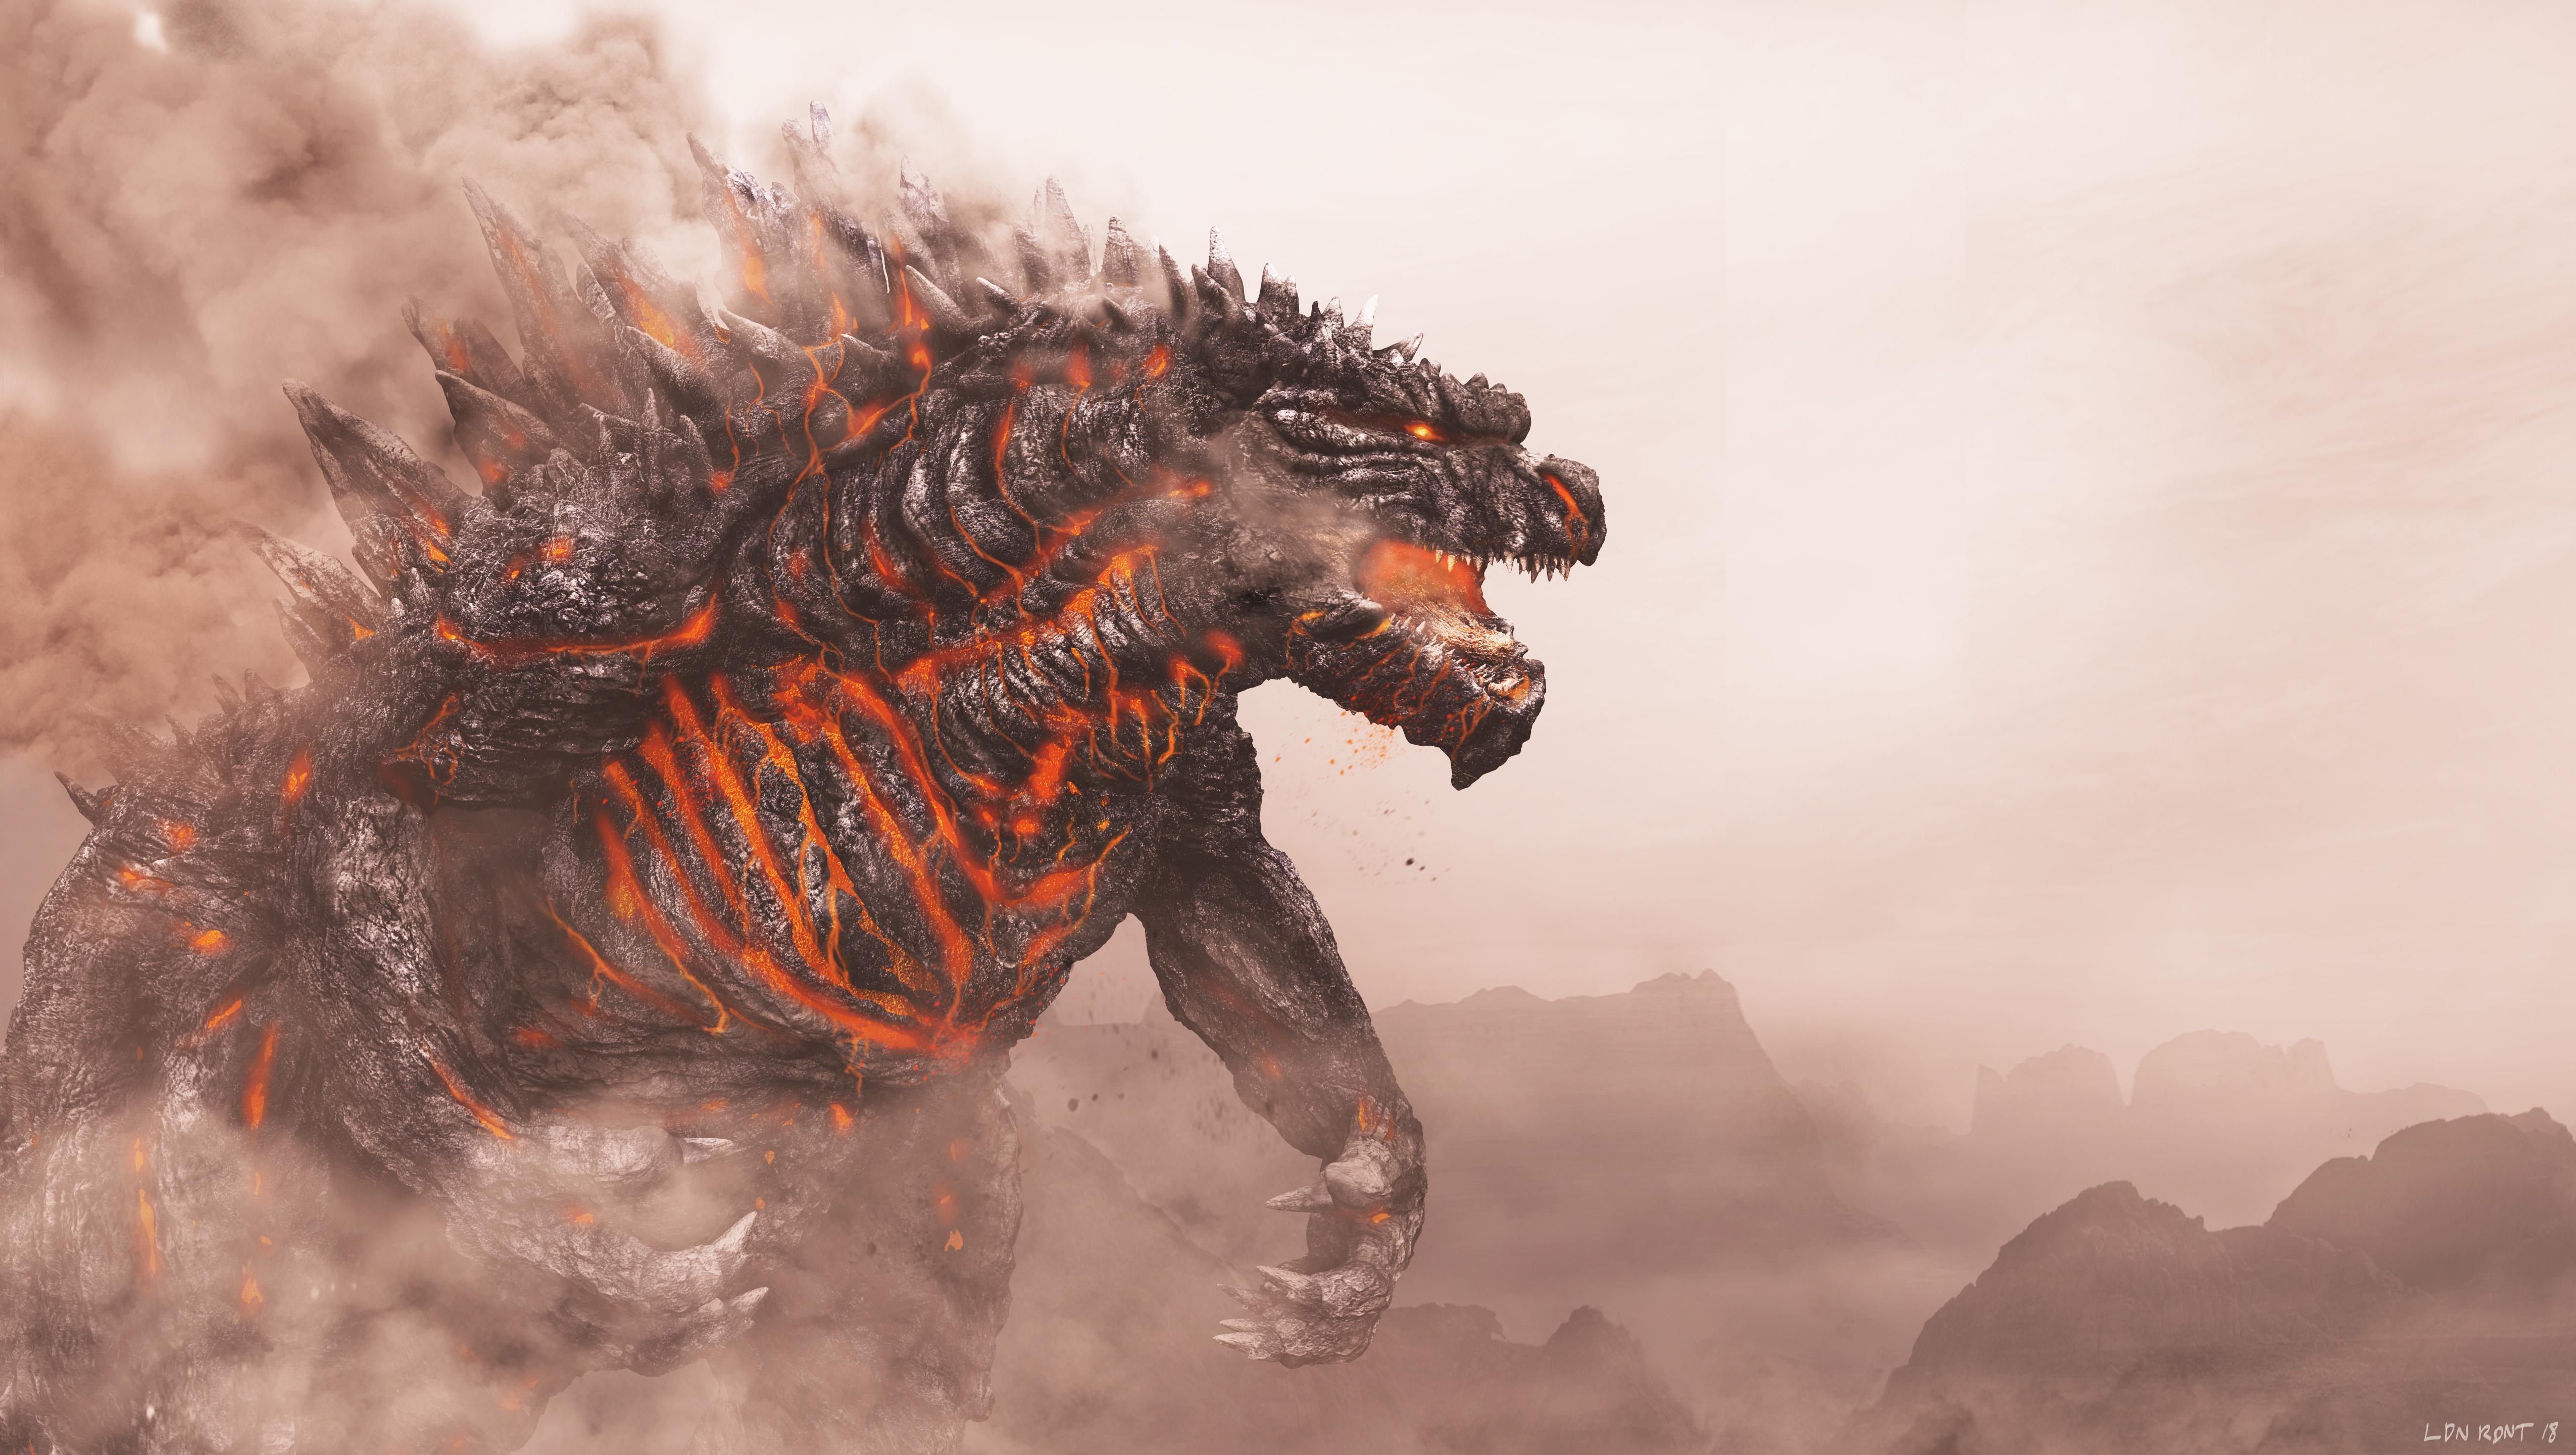 Shin Godzilla 4k Wallpapers - Wallpaper Cave